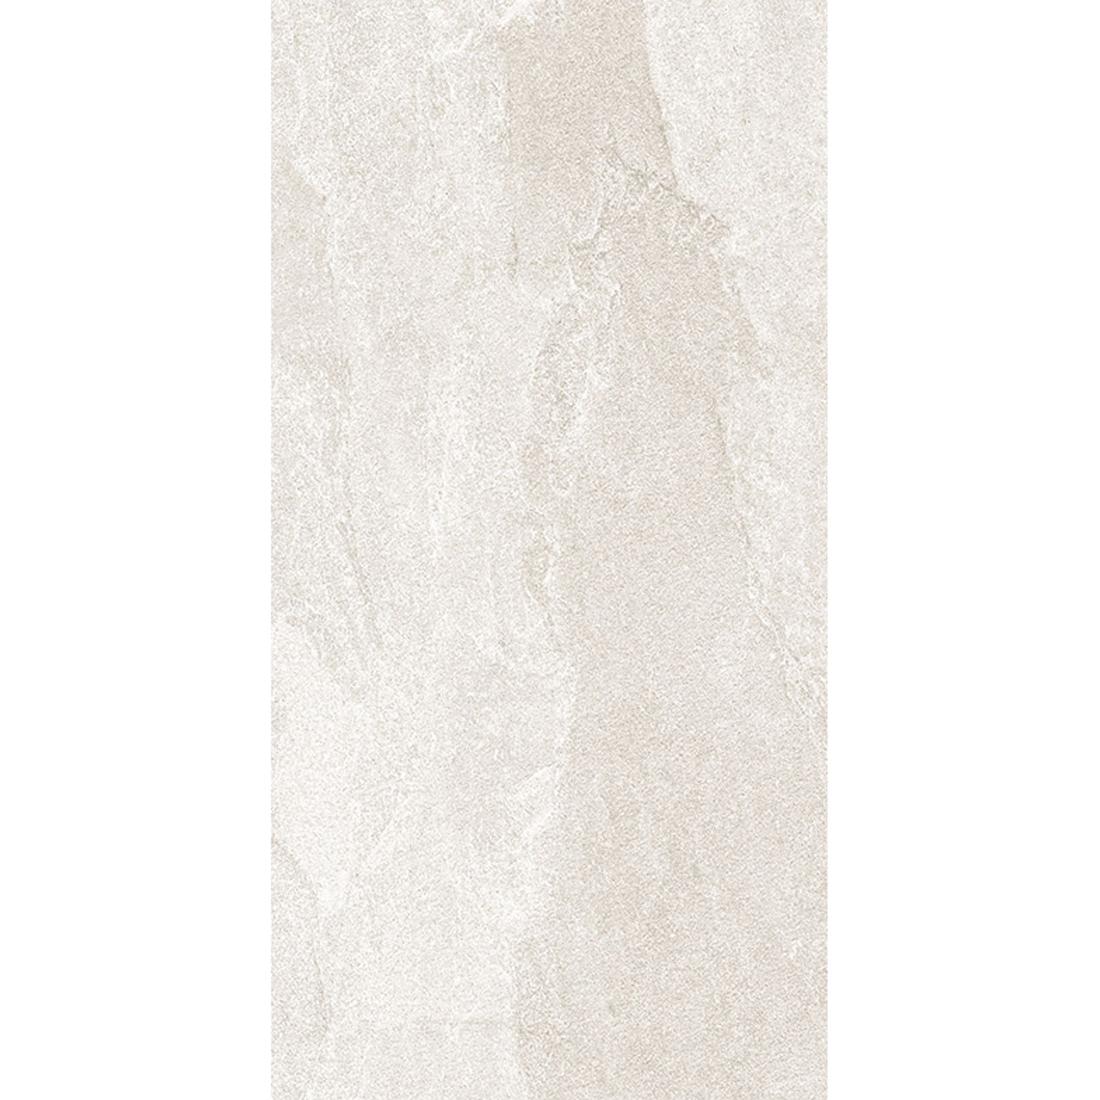 Nitco Nordic White N5001 Matte Glazed Vitrified Tile